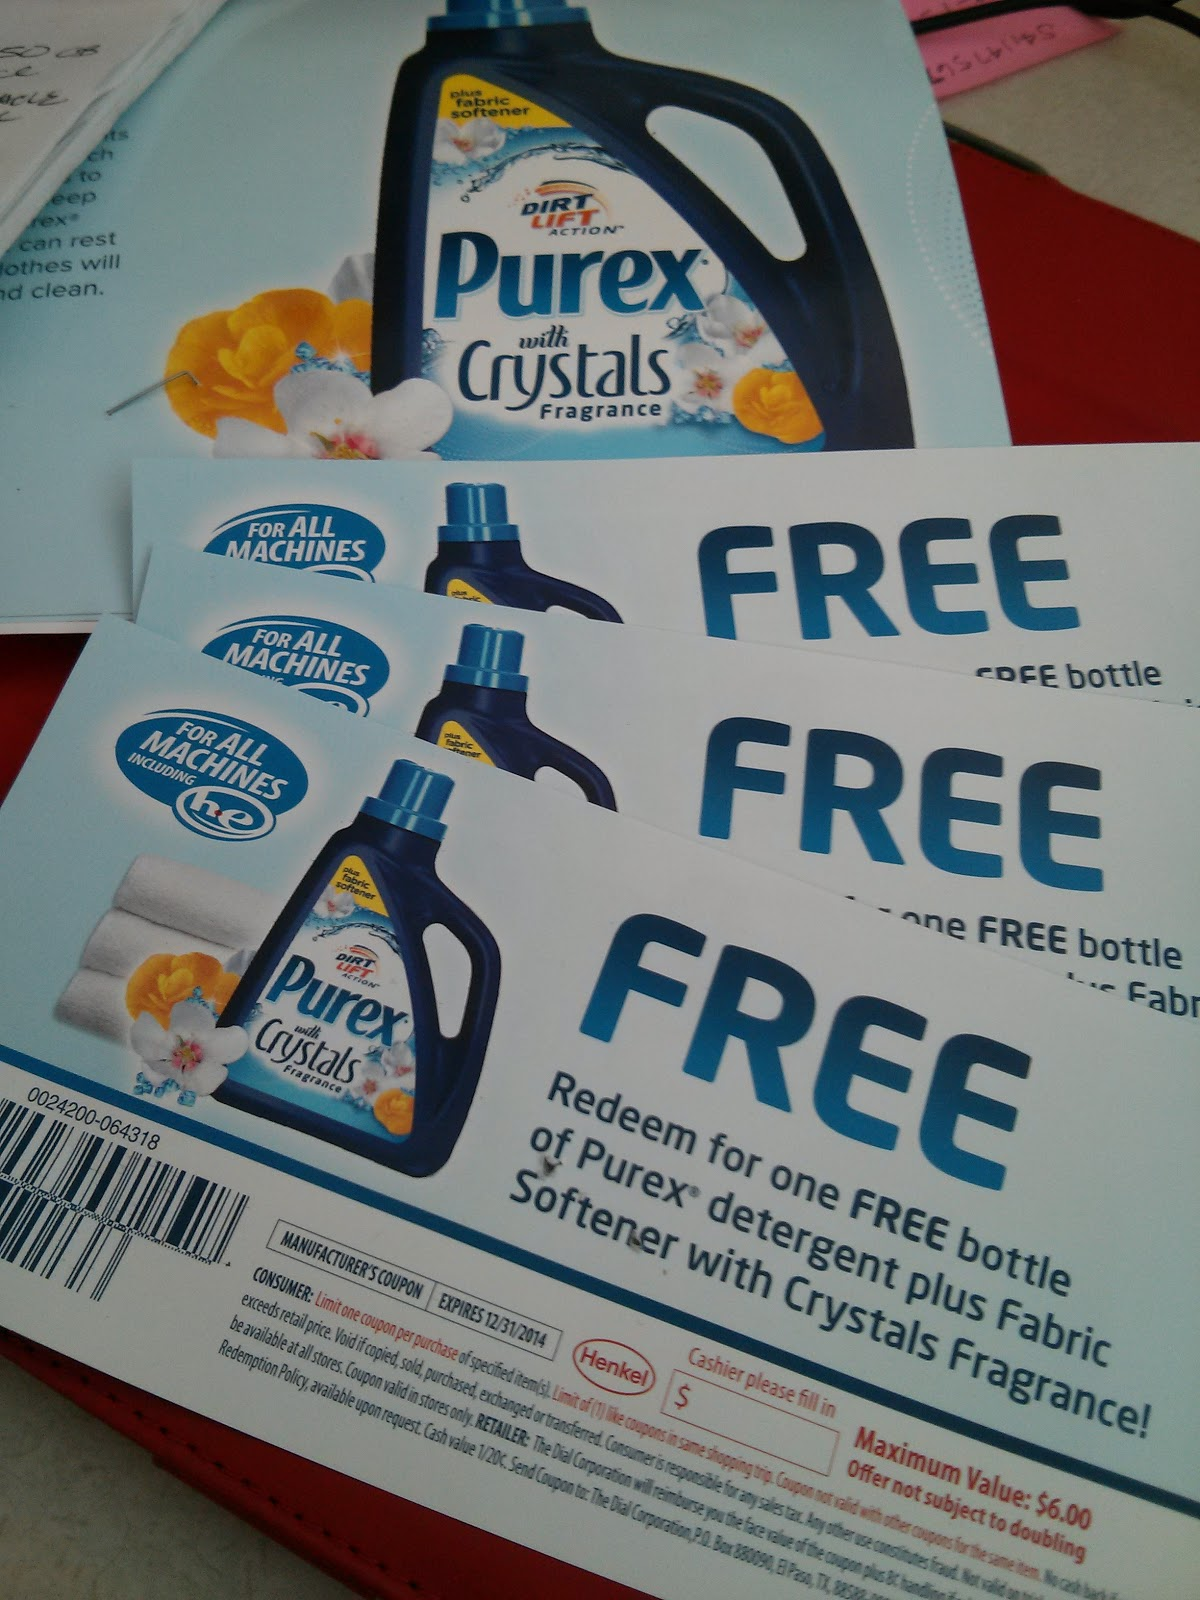 Purex crystals coupons